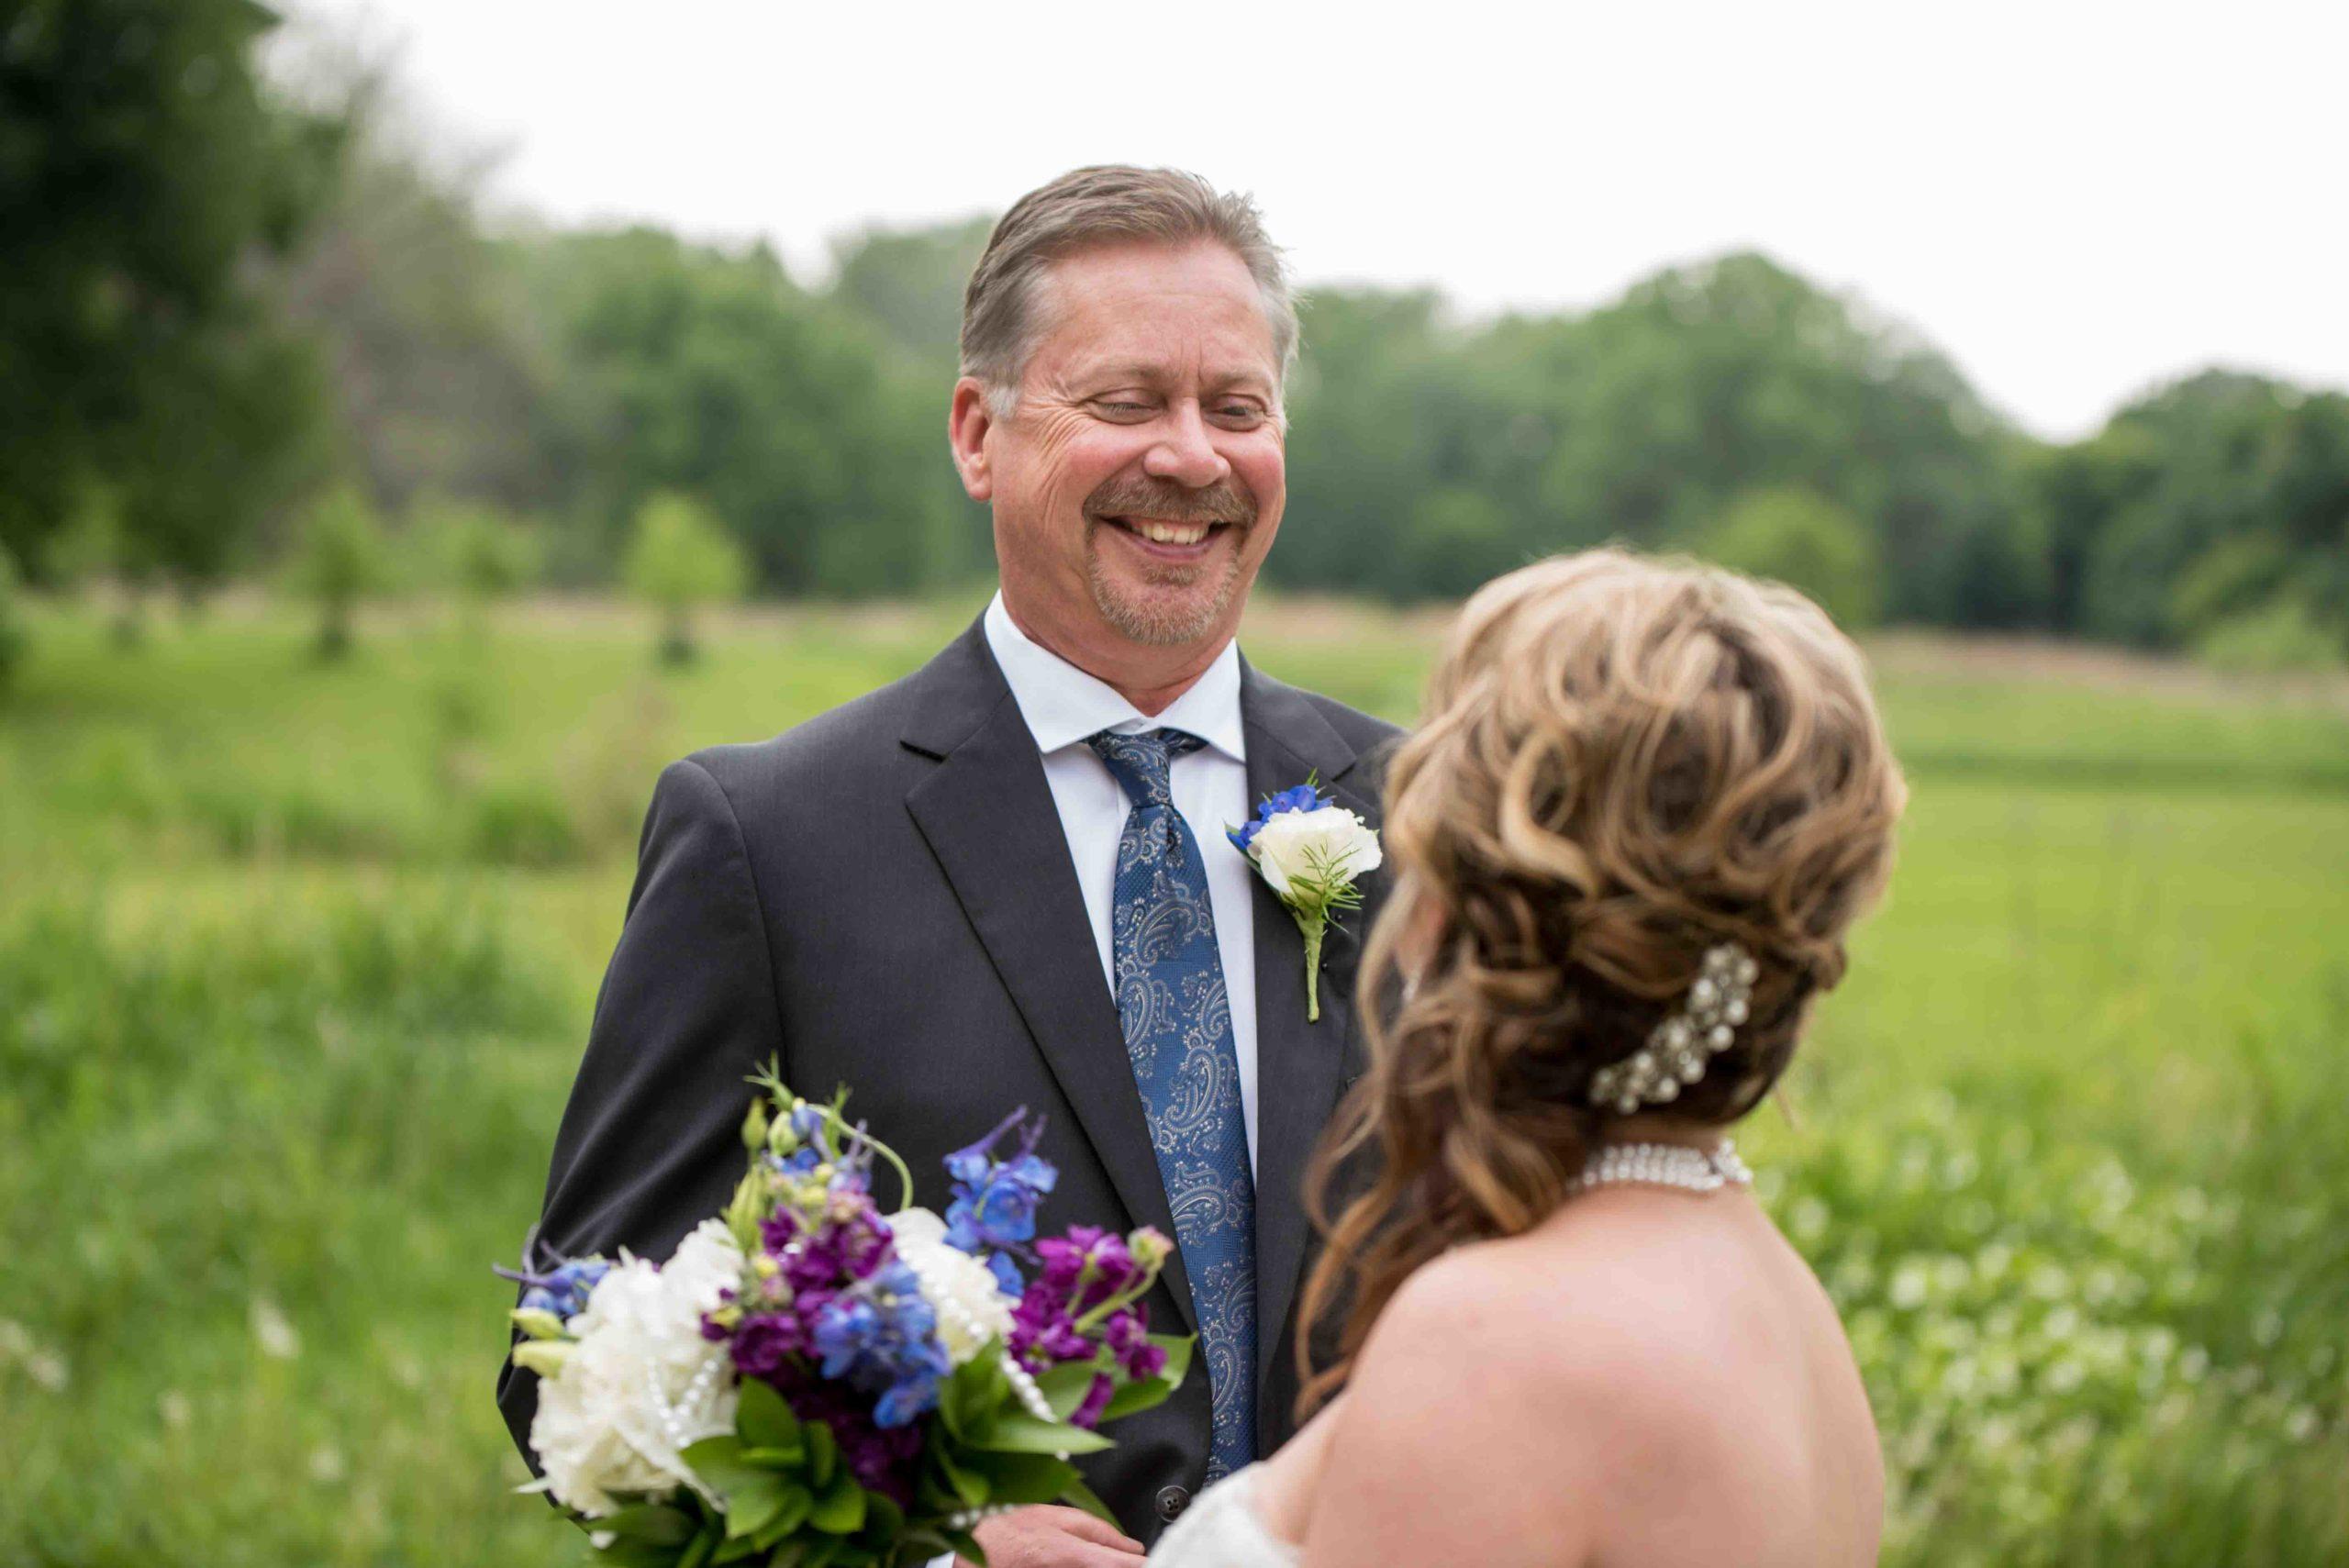 First Look - Wedding on Magnolia Blossom Cruises